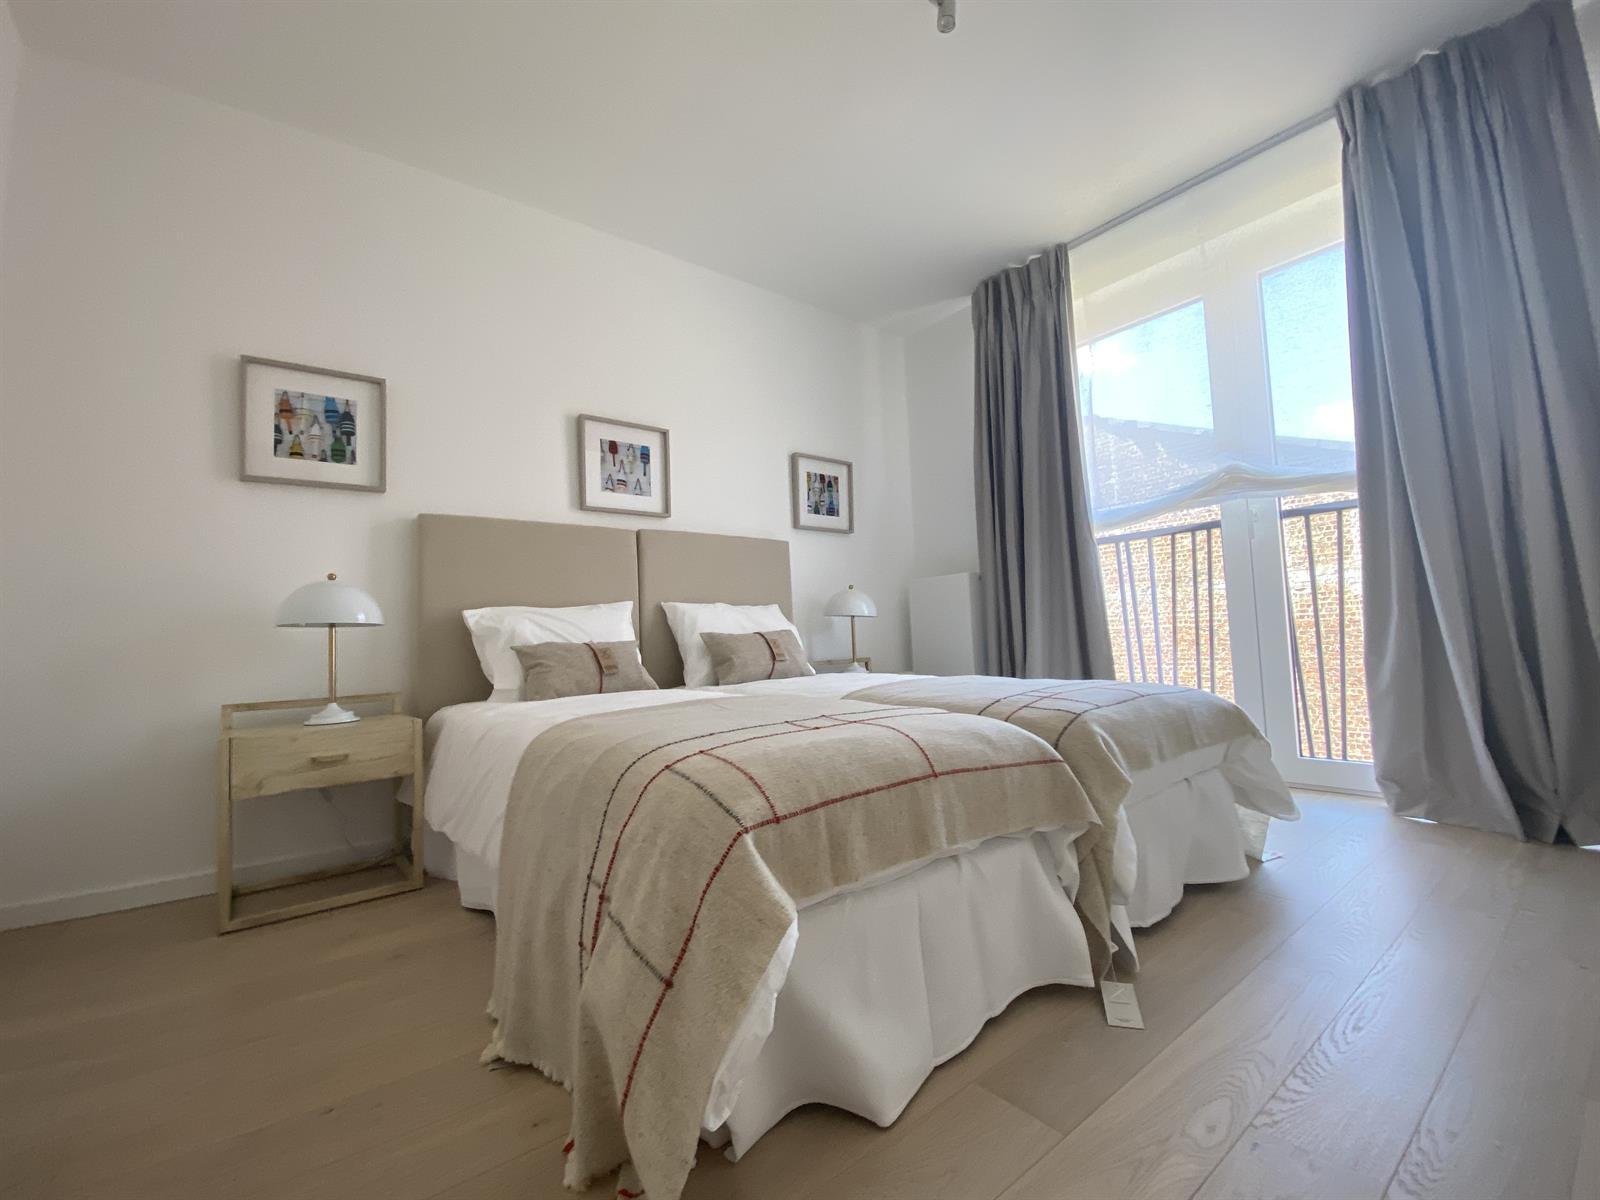 Appartement - Woluwe-Saint-Lambert - #4455478-7